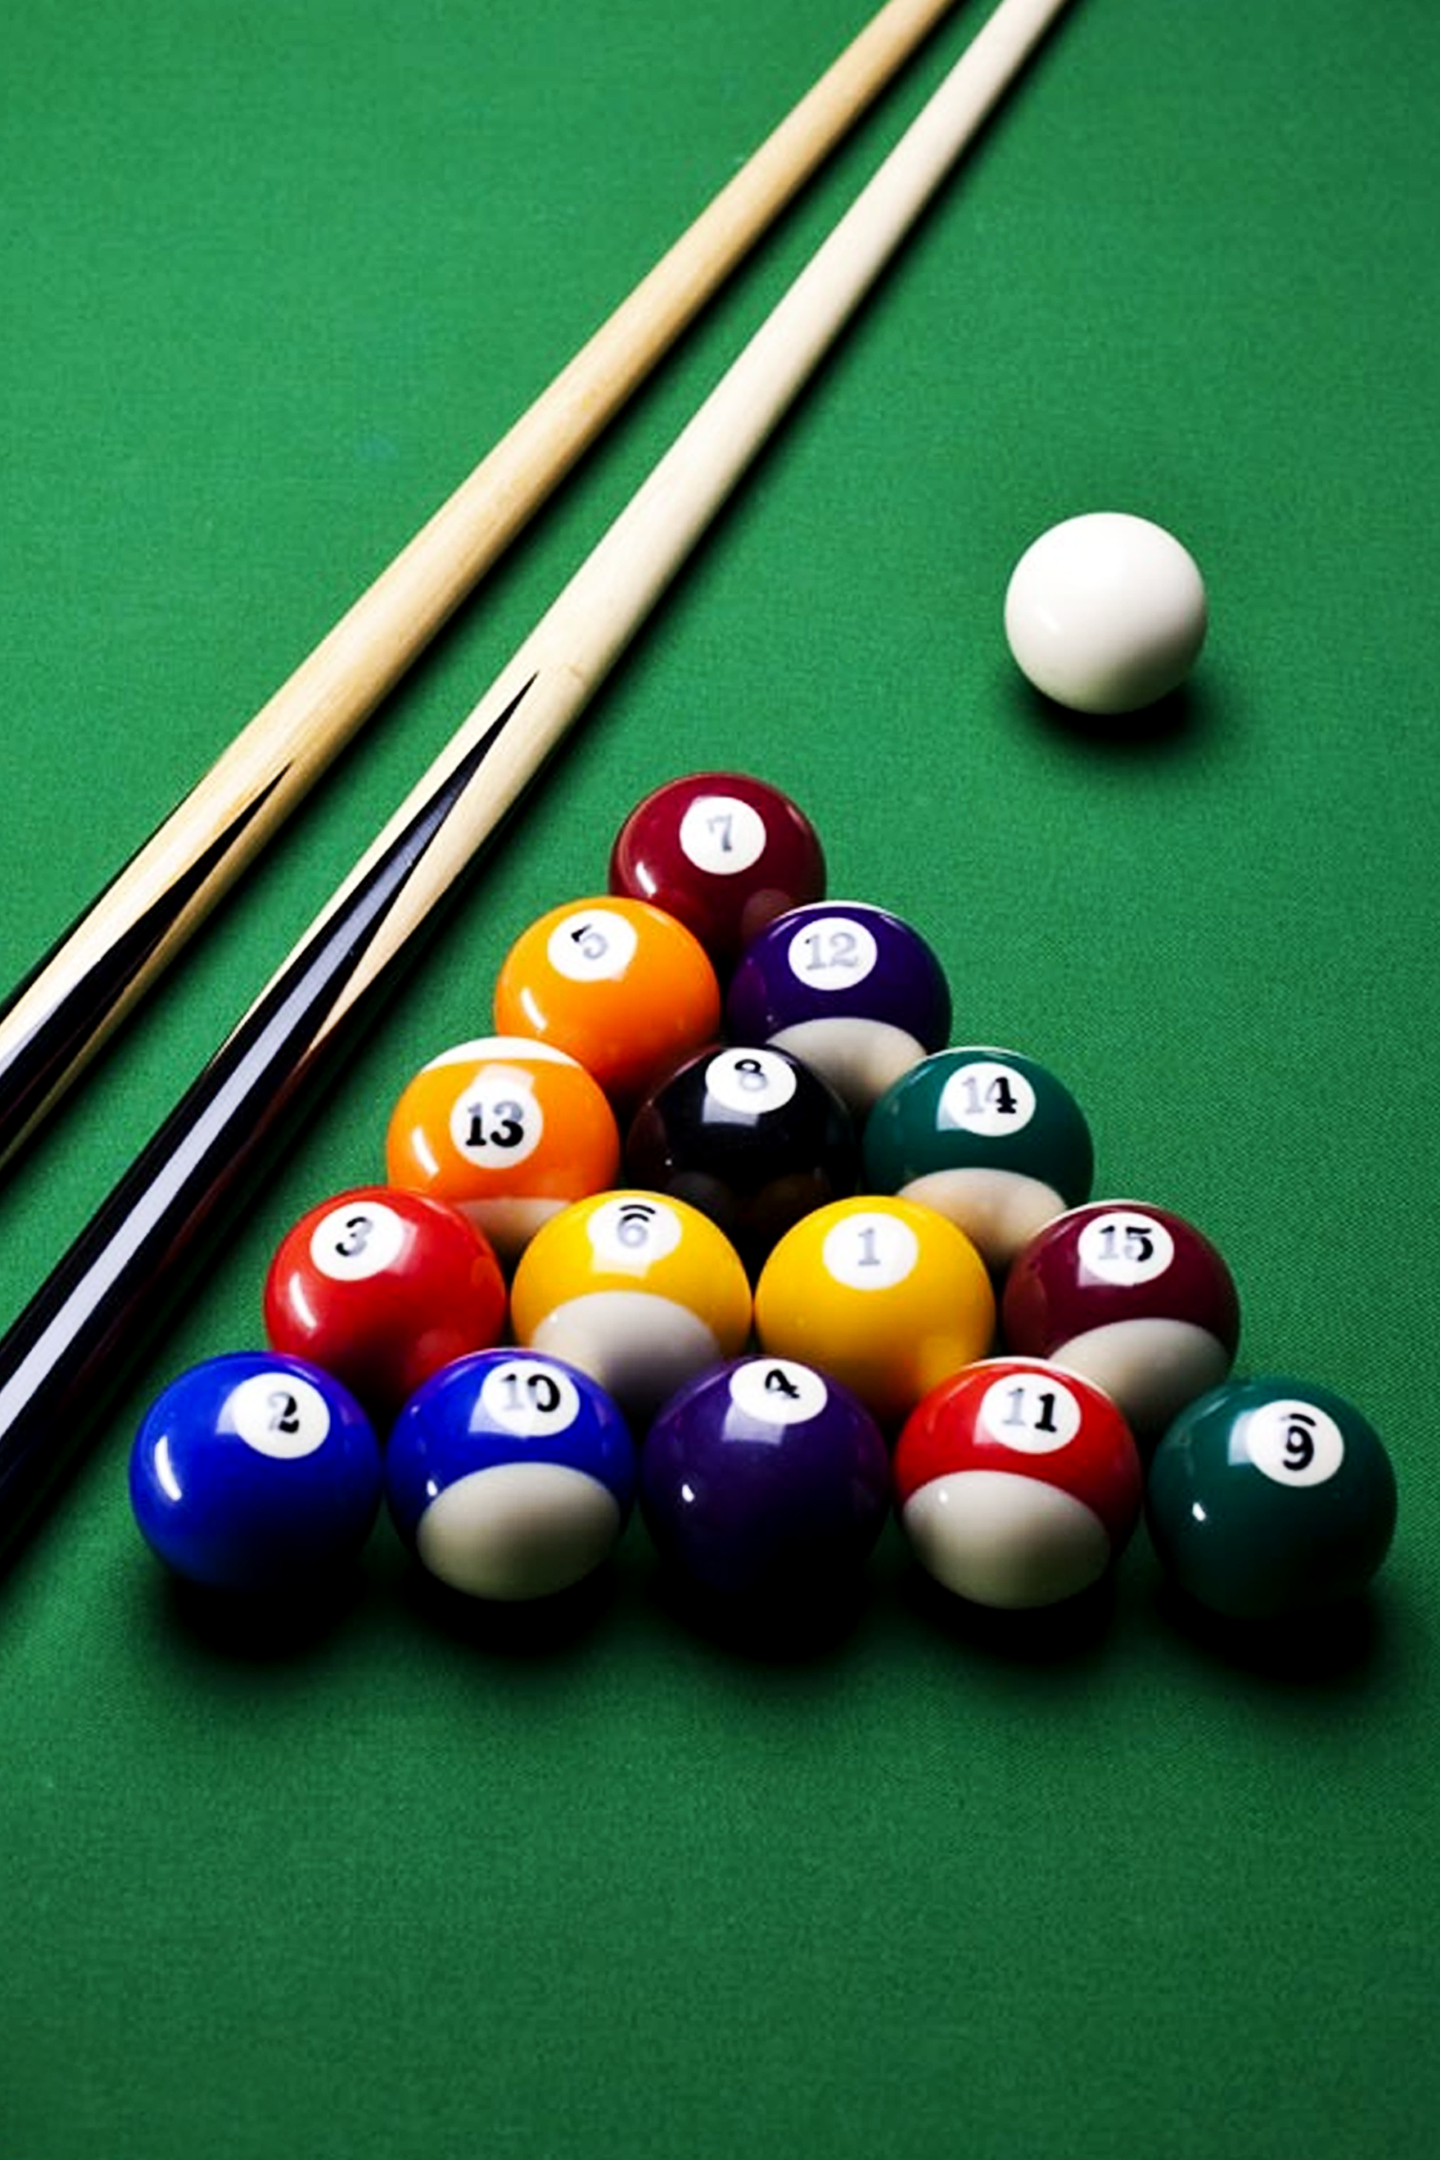 Pool Club: 8 Ball Match